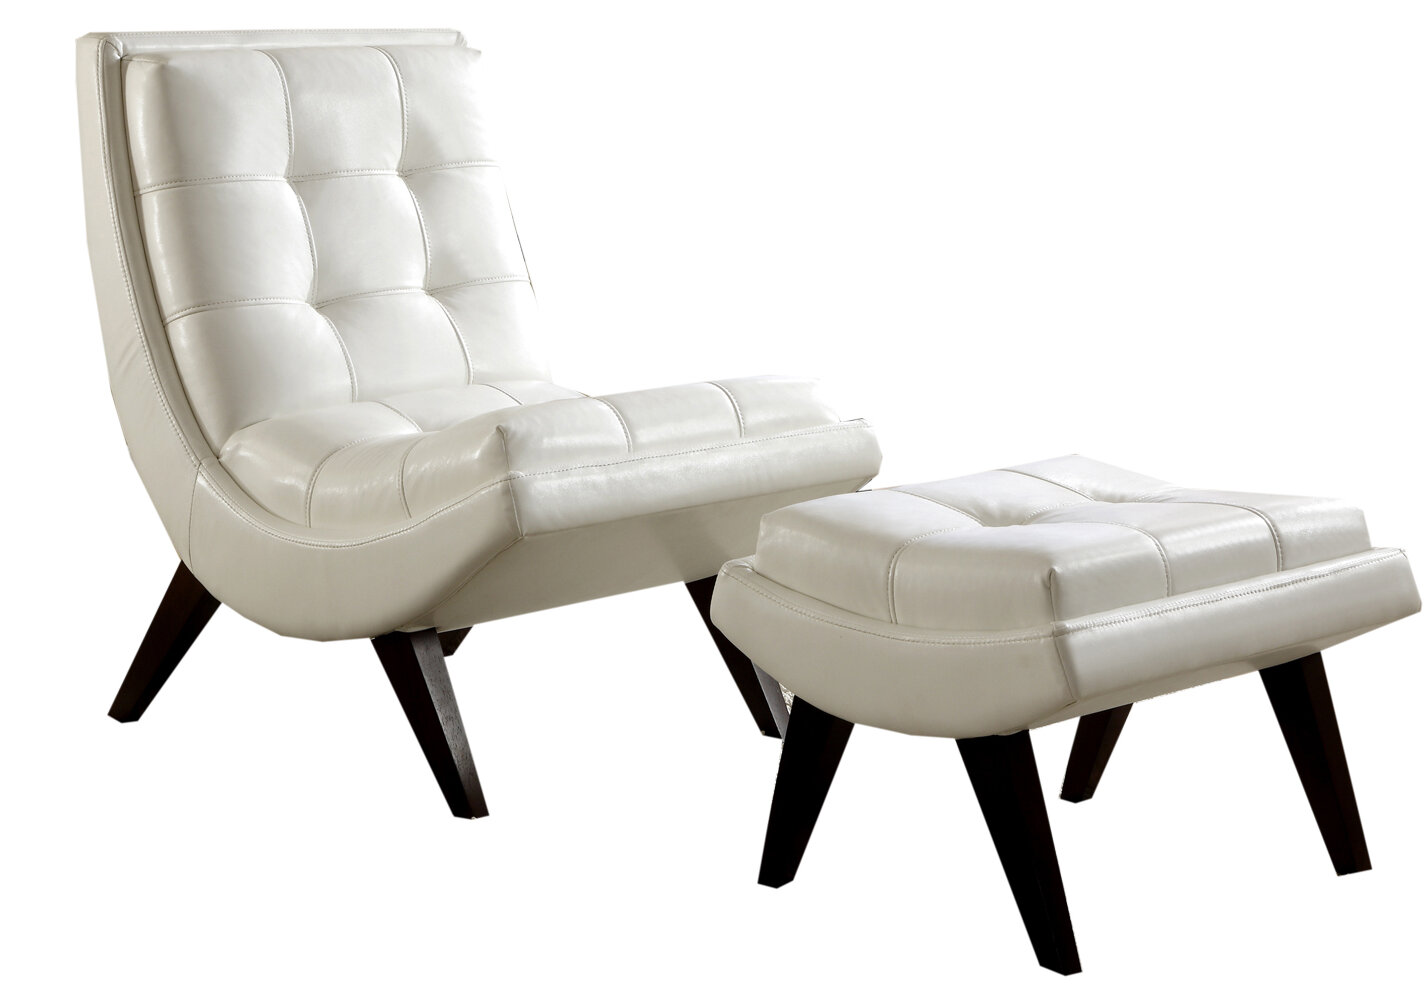 Merveilleux Mercury Row Breit Lounge Chair U0026 Ottoman Set U0026 Reviews | Wayfair